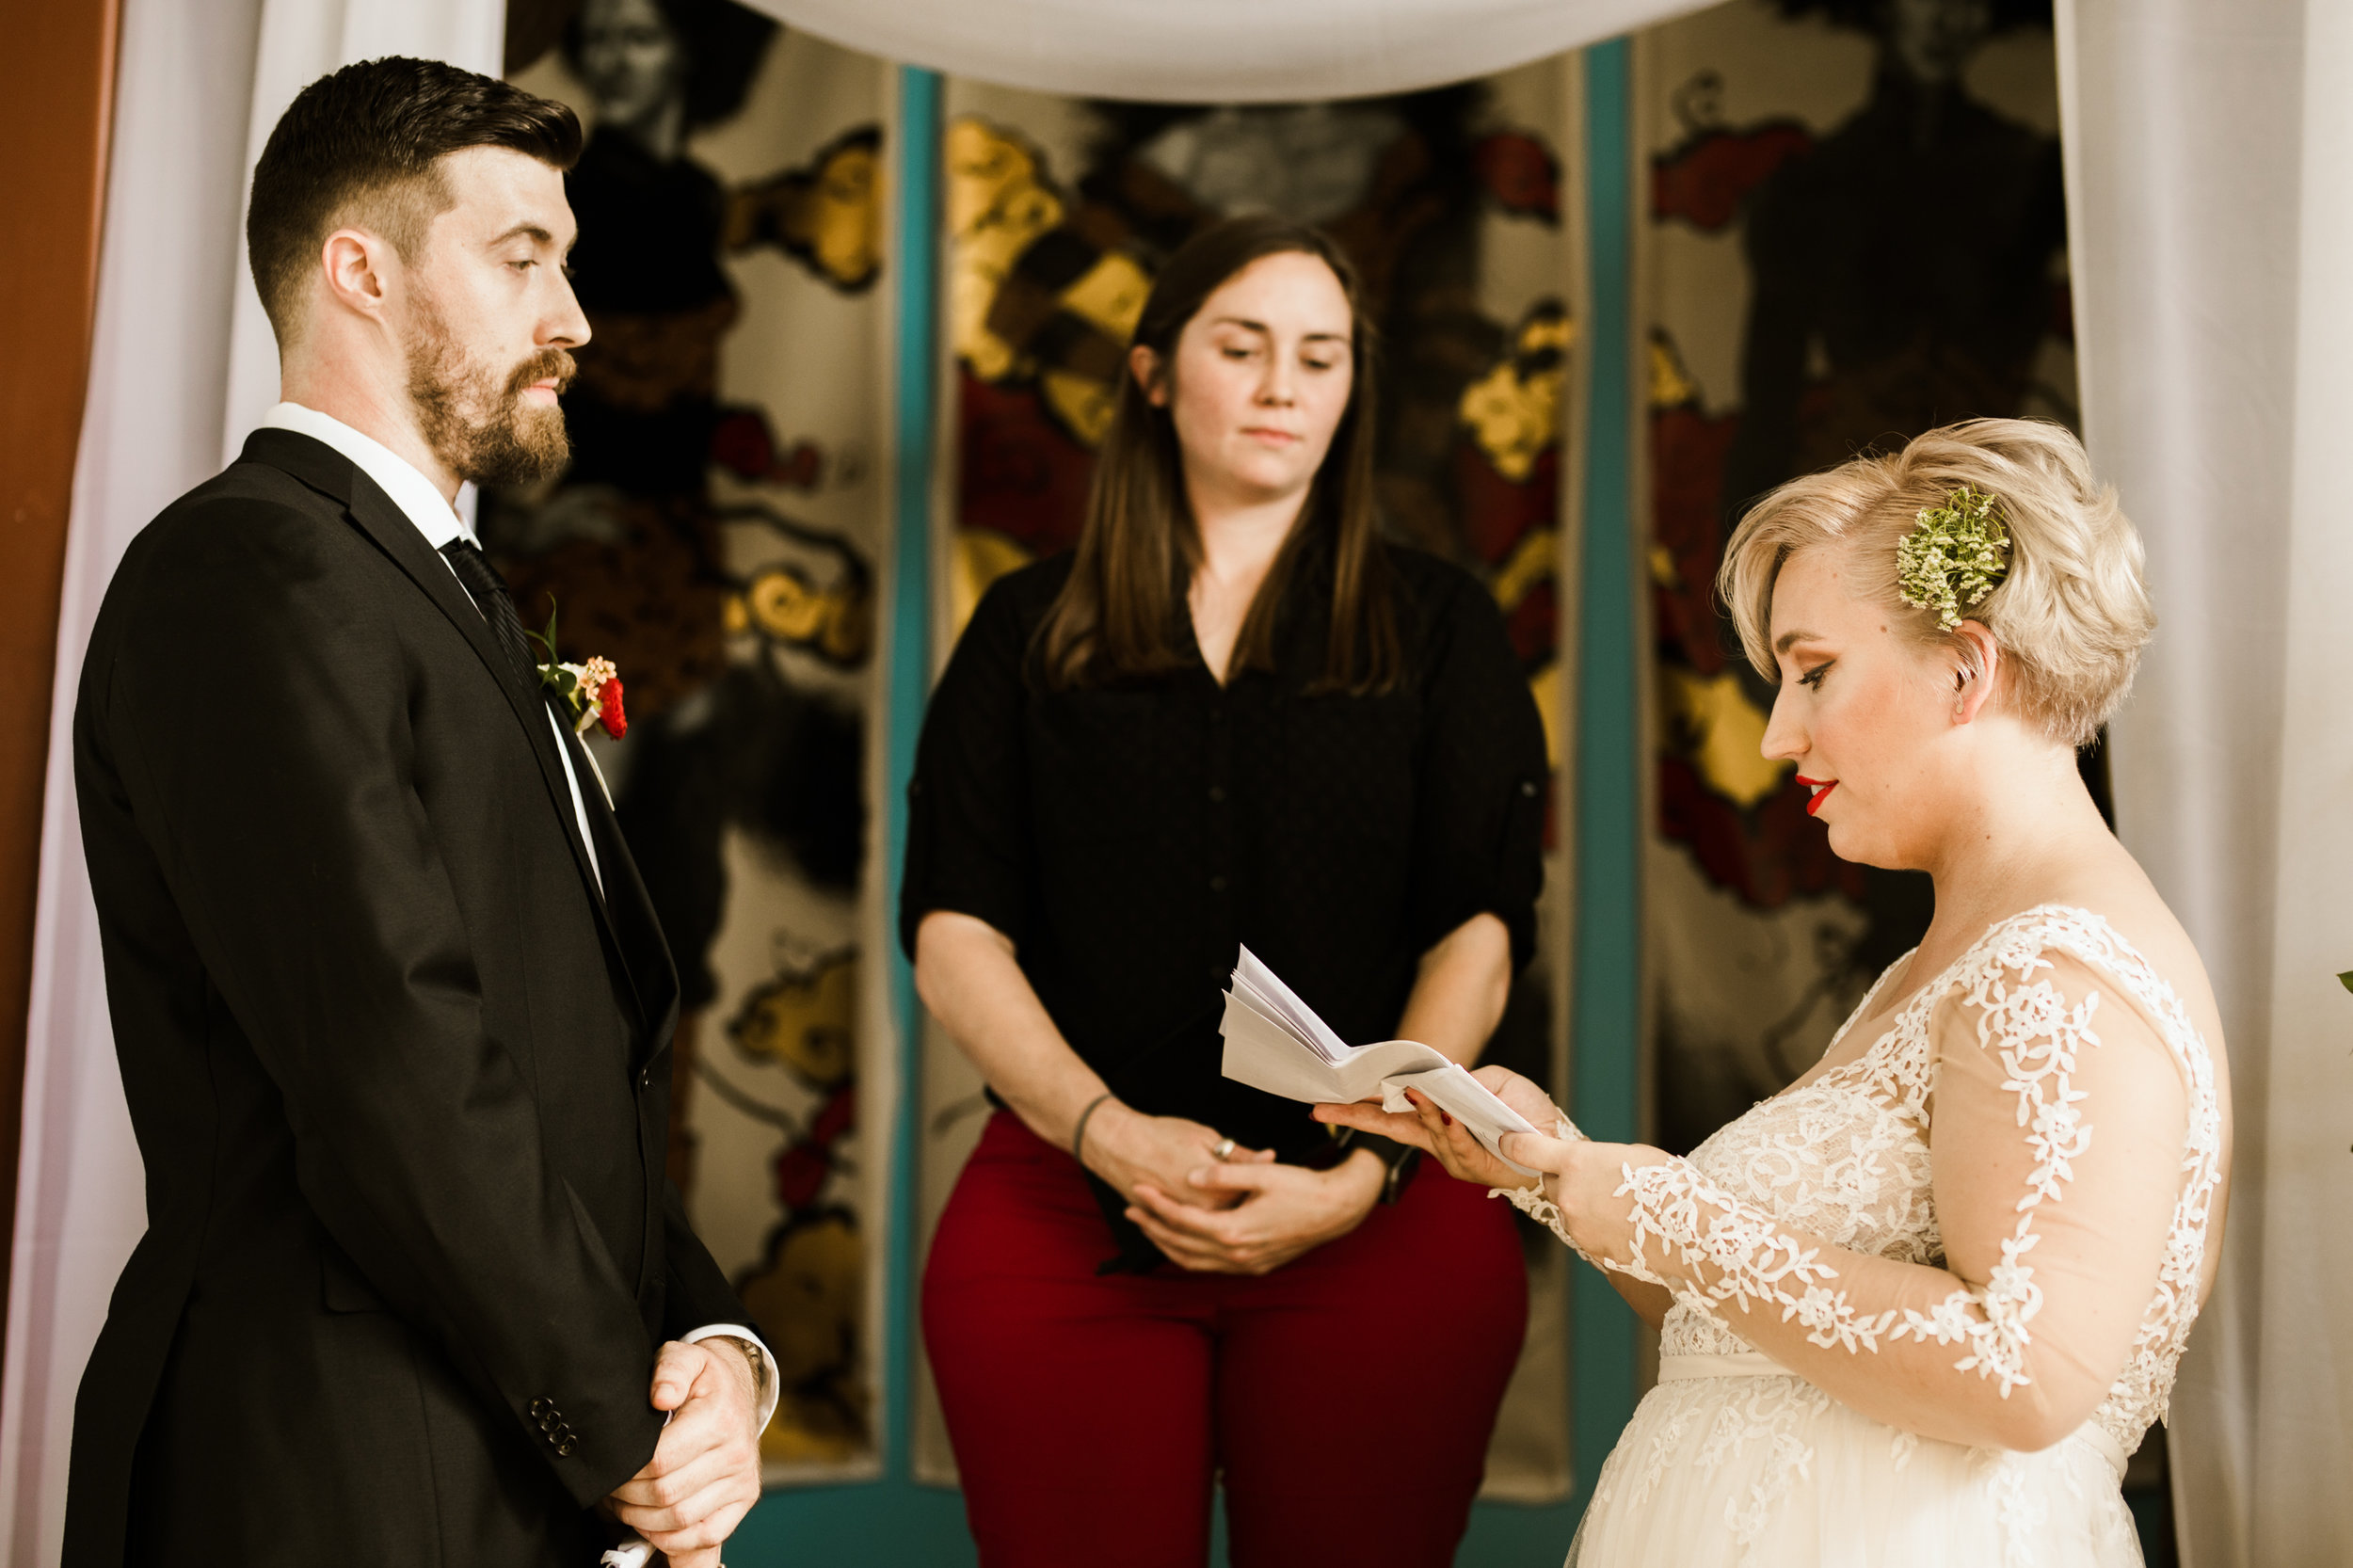 Kentucky Wedding Louisville Wedding Photographer 2018 Crystal Ludwick Photo Louisville Wedding Photographer Kentucky Wedding Photographer (39 of 105).jpg